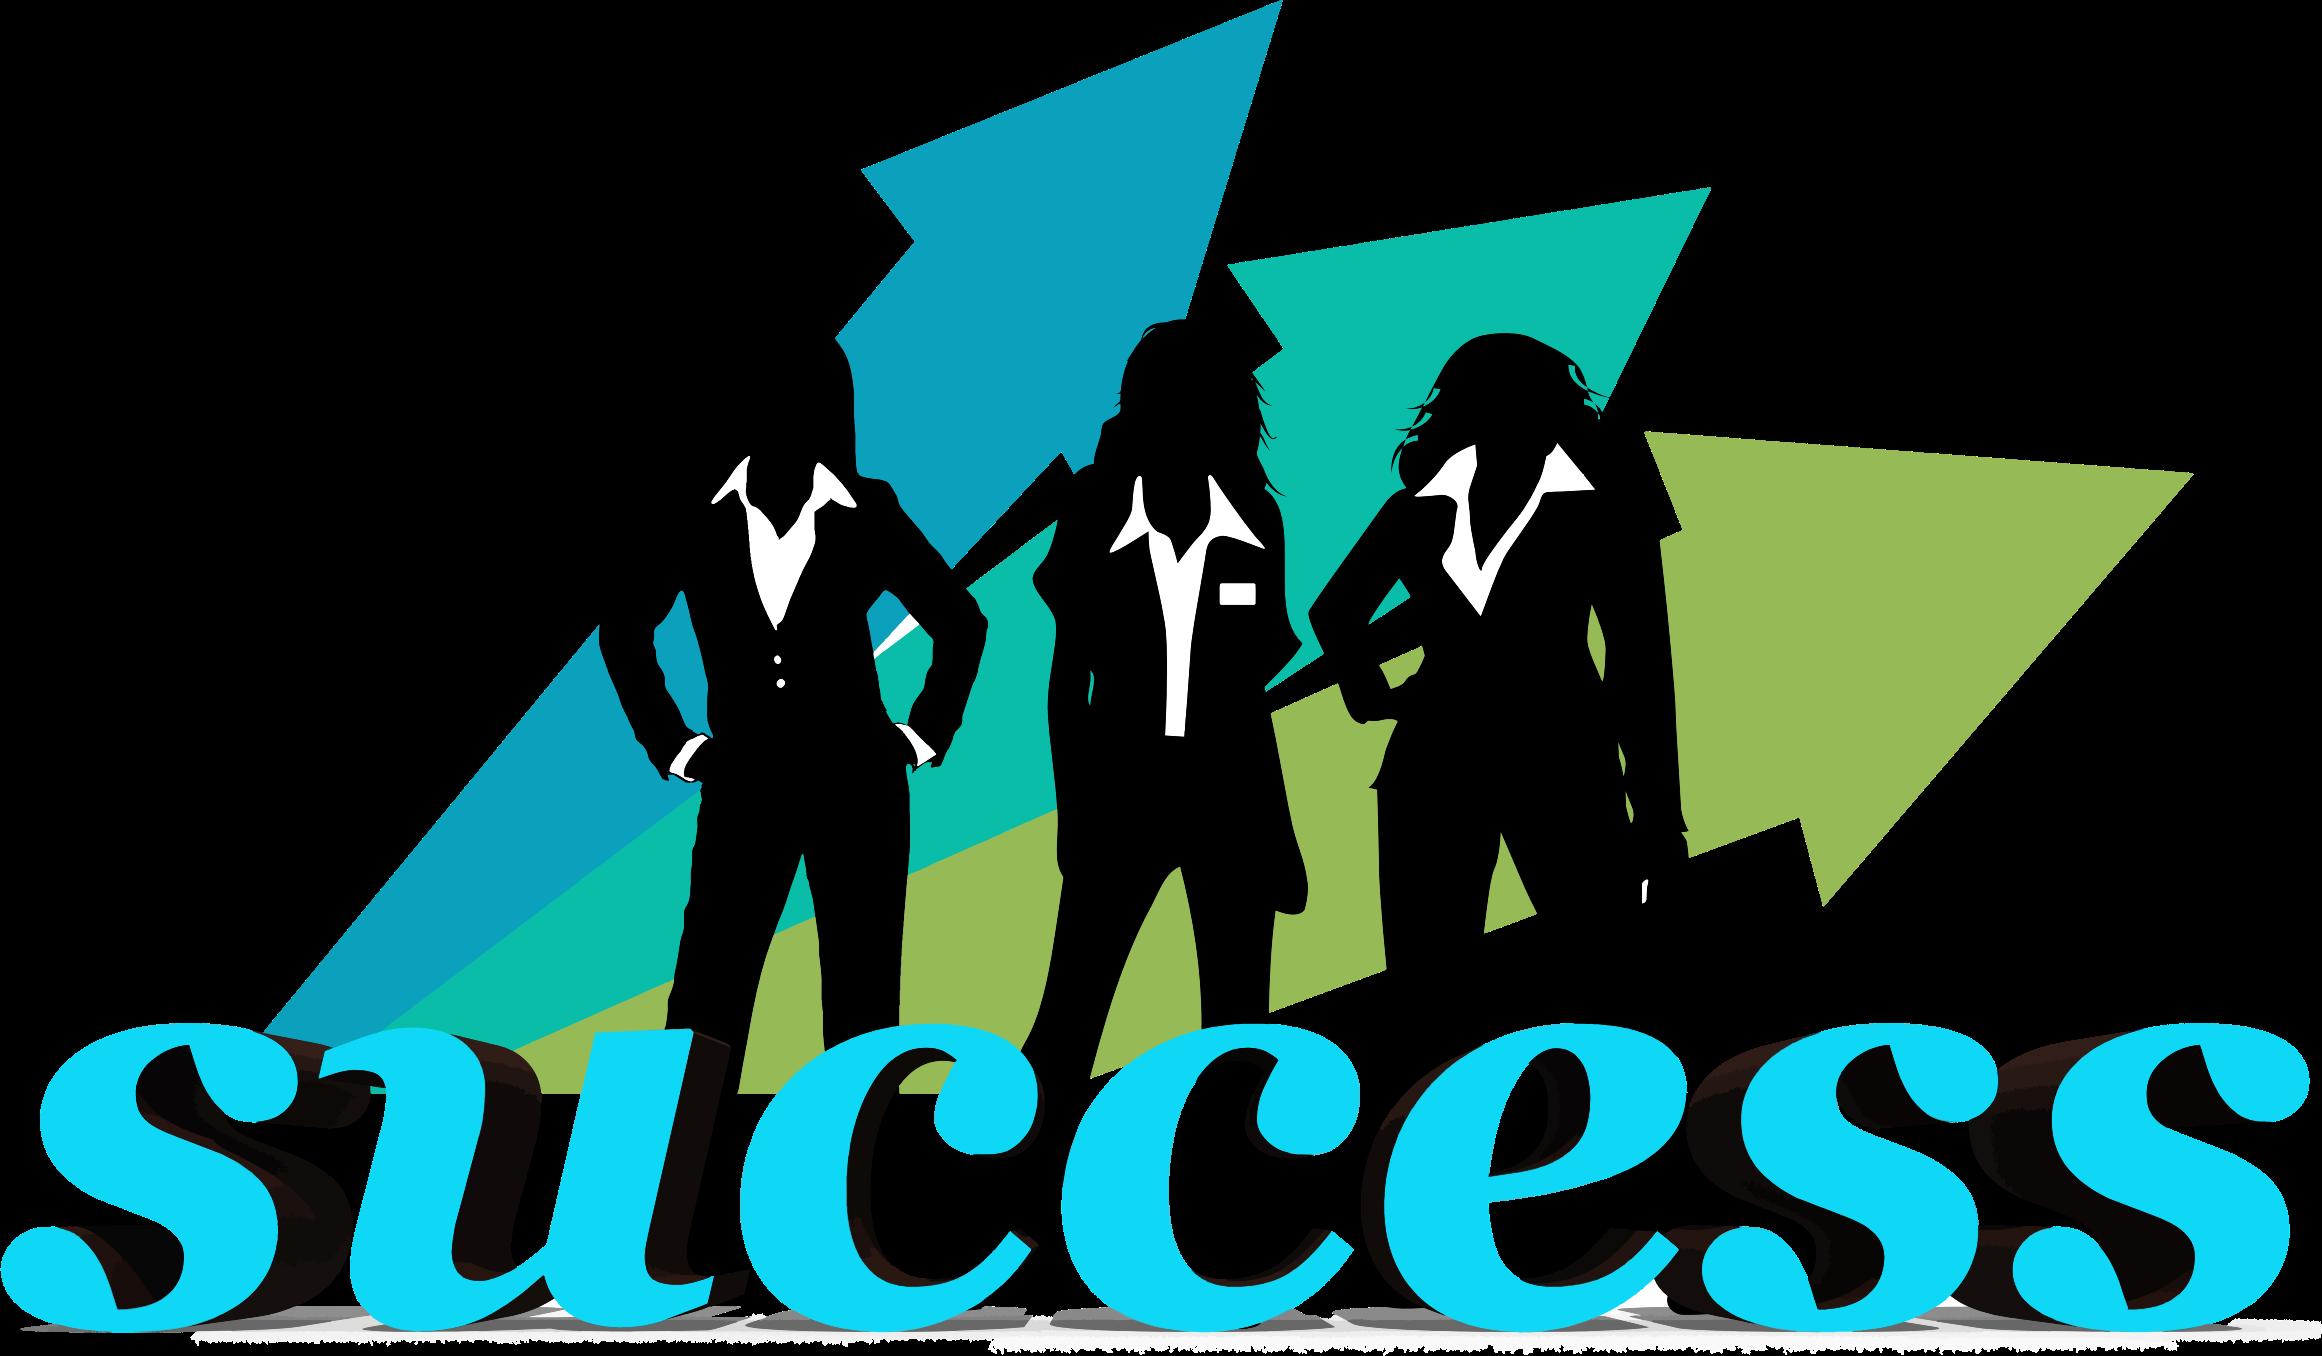 Three businesswomen big image. Businesswoman clipart success woman